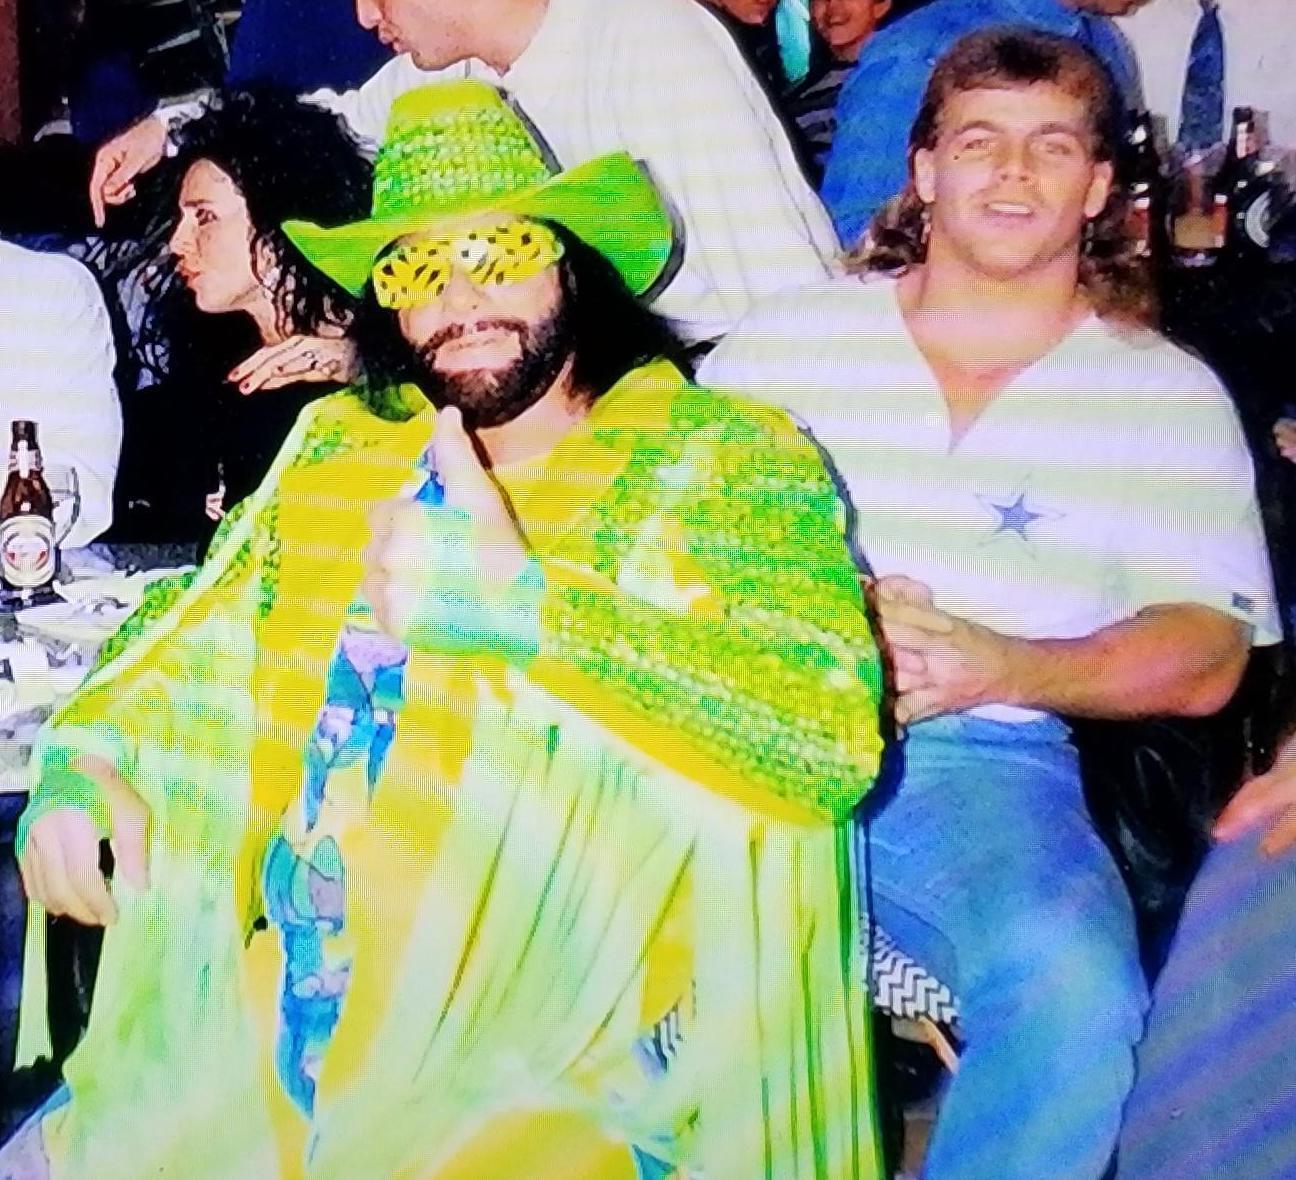 Randy Savage and Shawn Michaels - A feud denied.